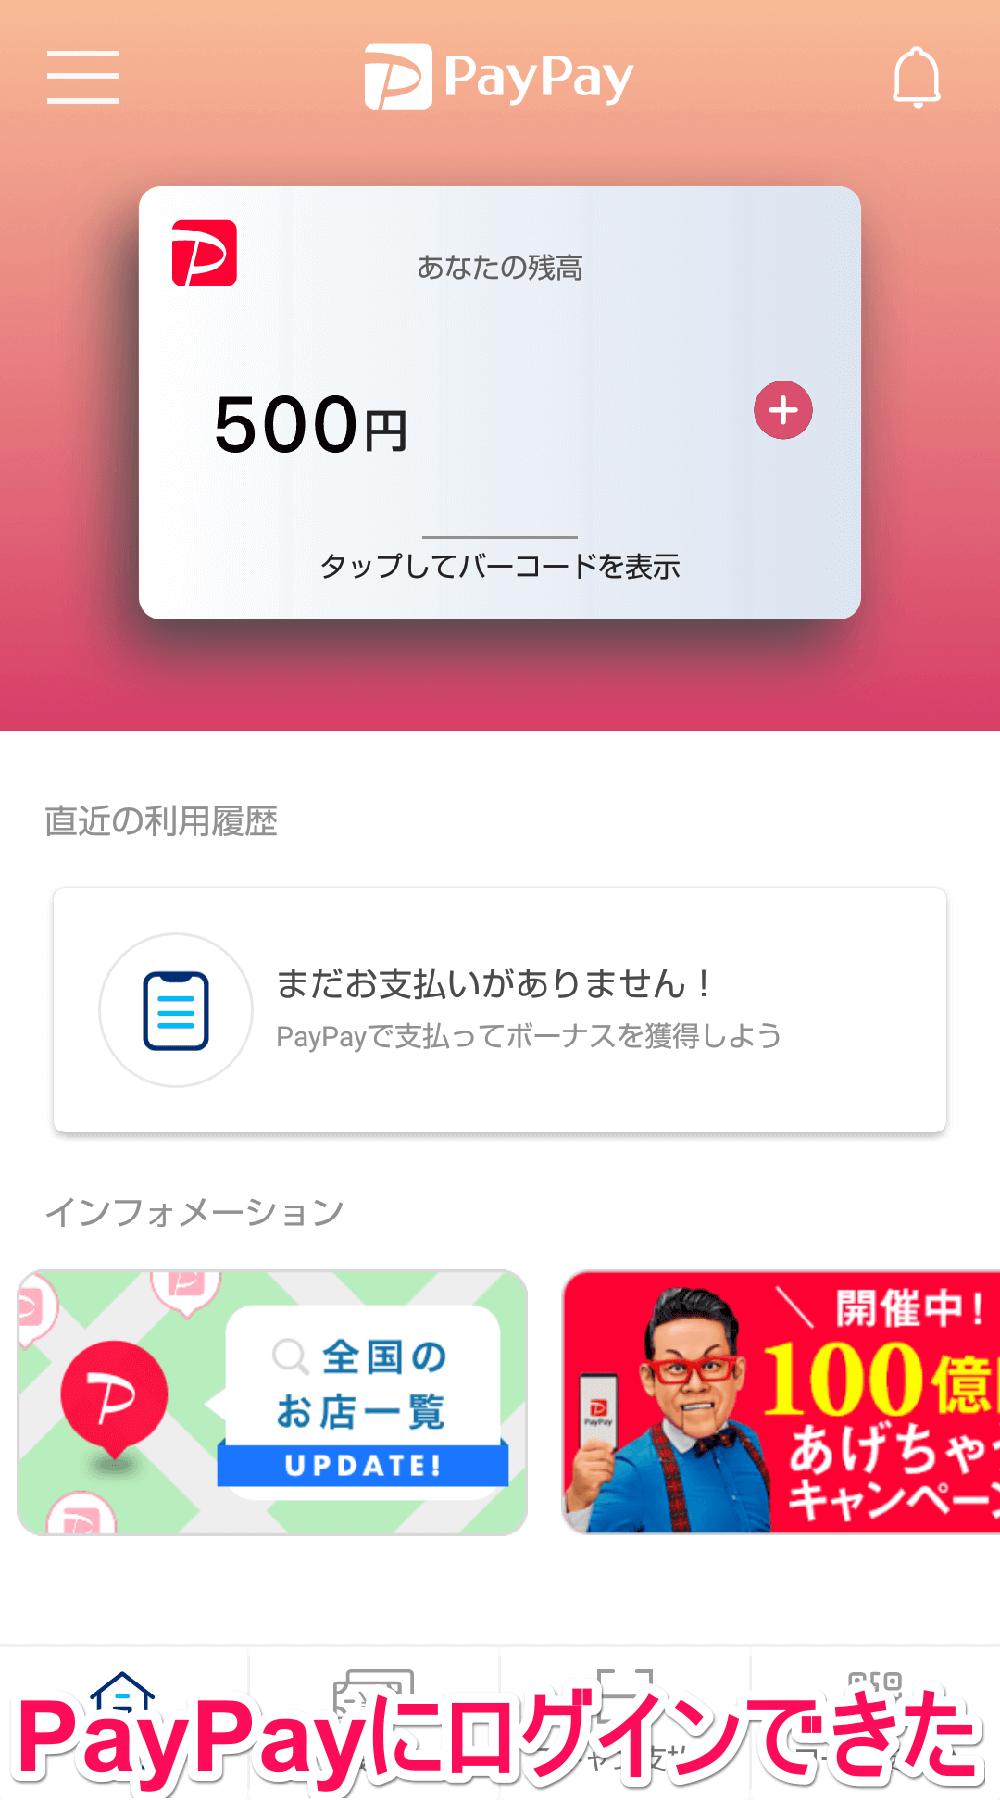 PayPayアプリに新規登録が完了してログインできた画面